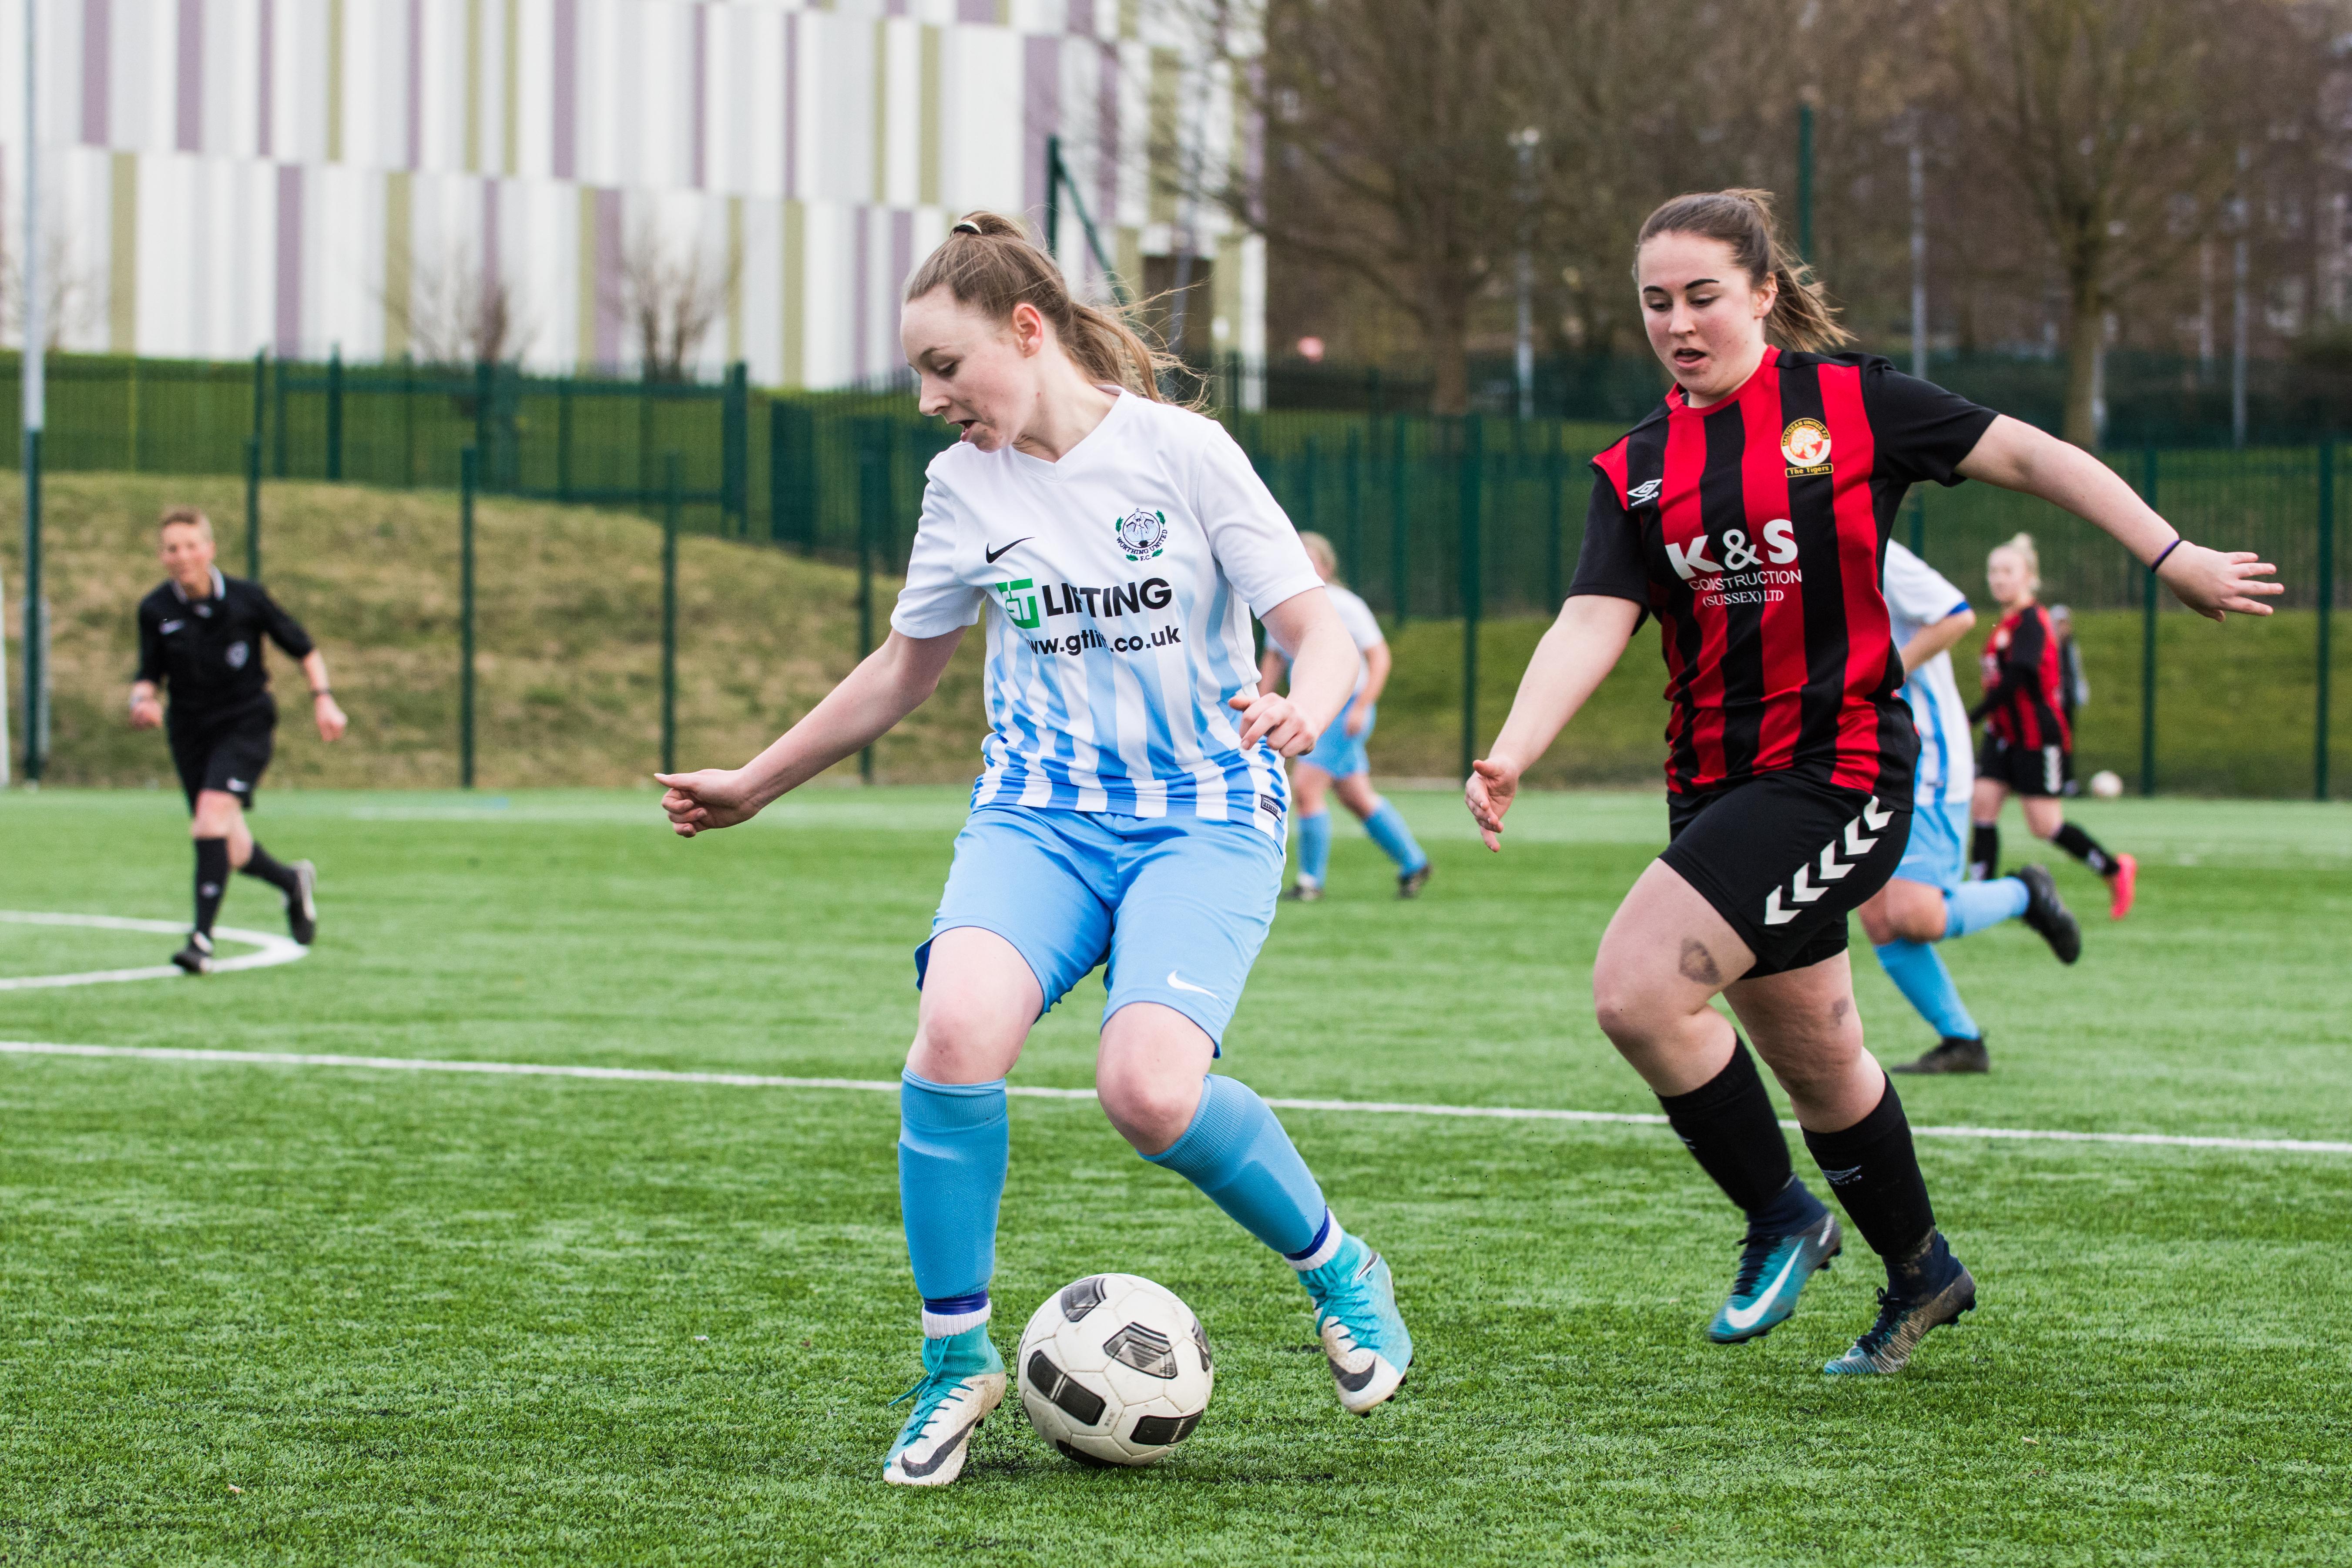 DAVID_JEFFERY Saltdean Utd Ladies FC vs Worthing Utd Ladies FC 11.03.18 58